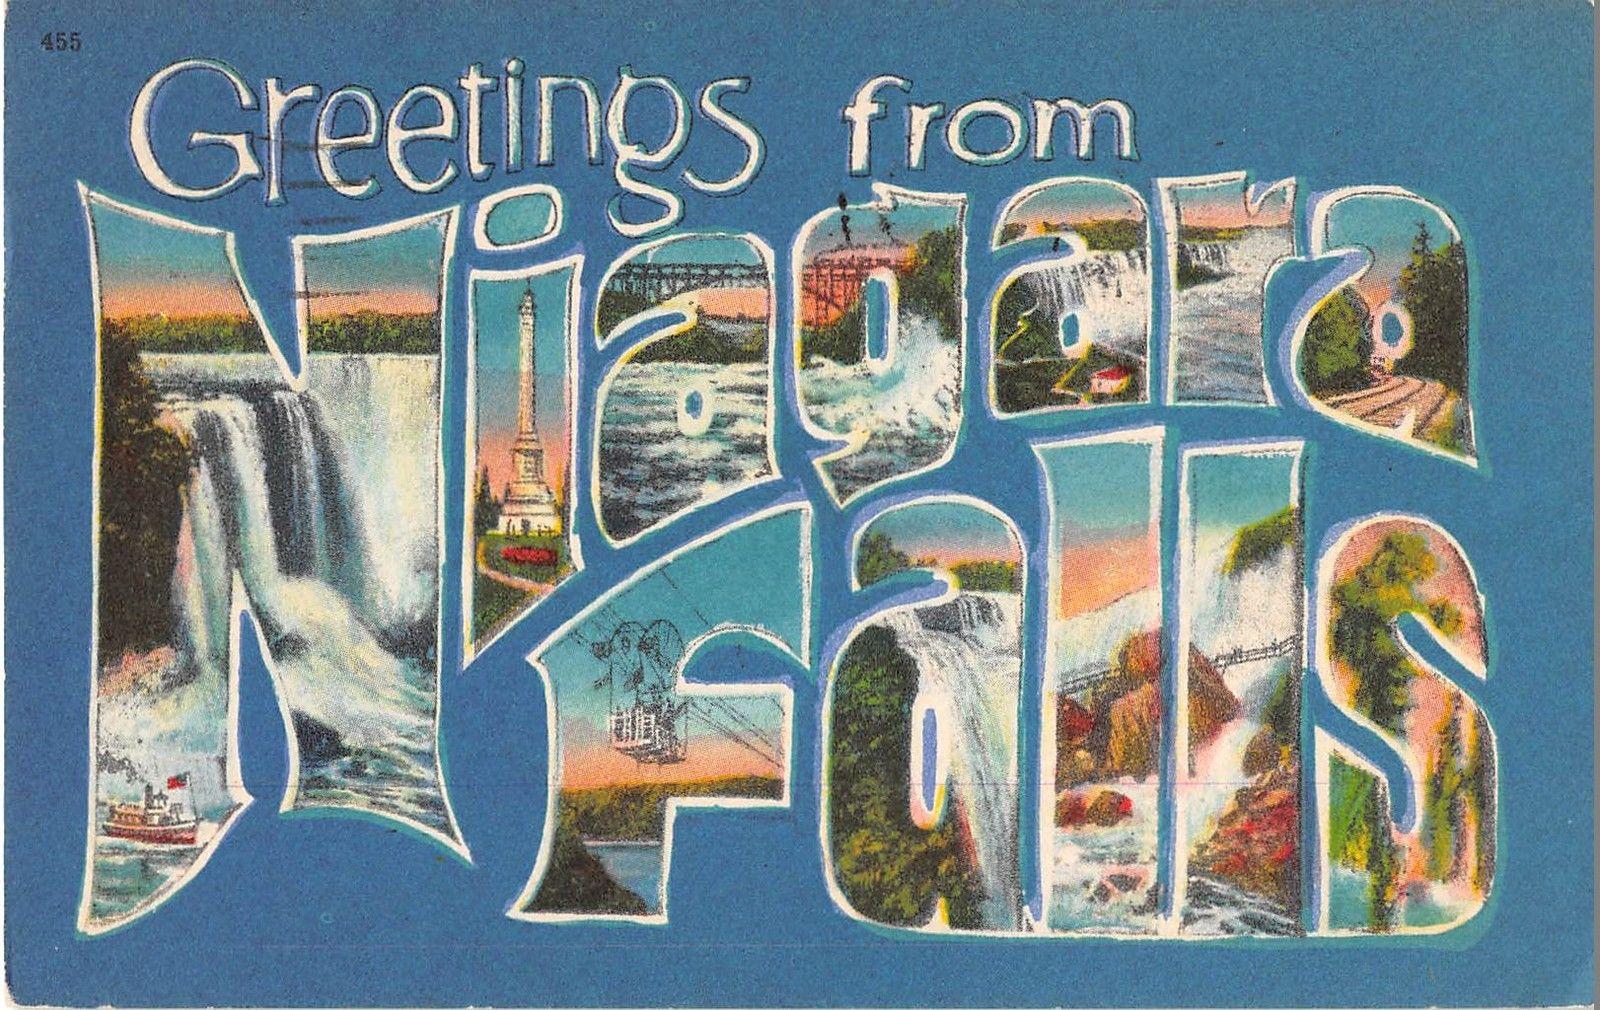 Niagara falls new york greetings large letter antique postcard niagara falls new york greetings large letter antique postcard j15125 mary l martin ltd postcards m4hsunfo